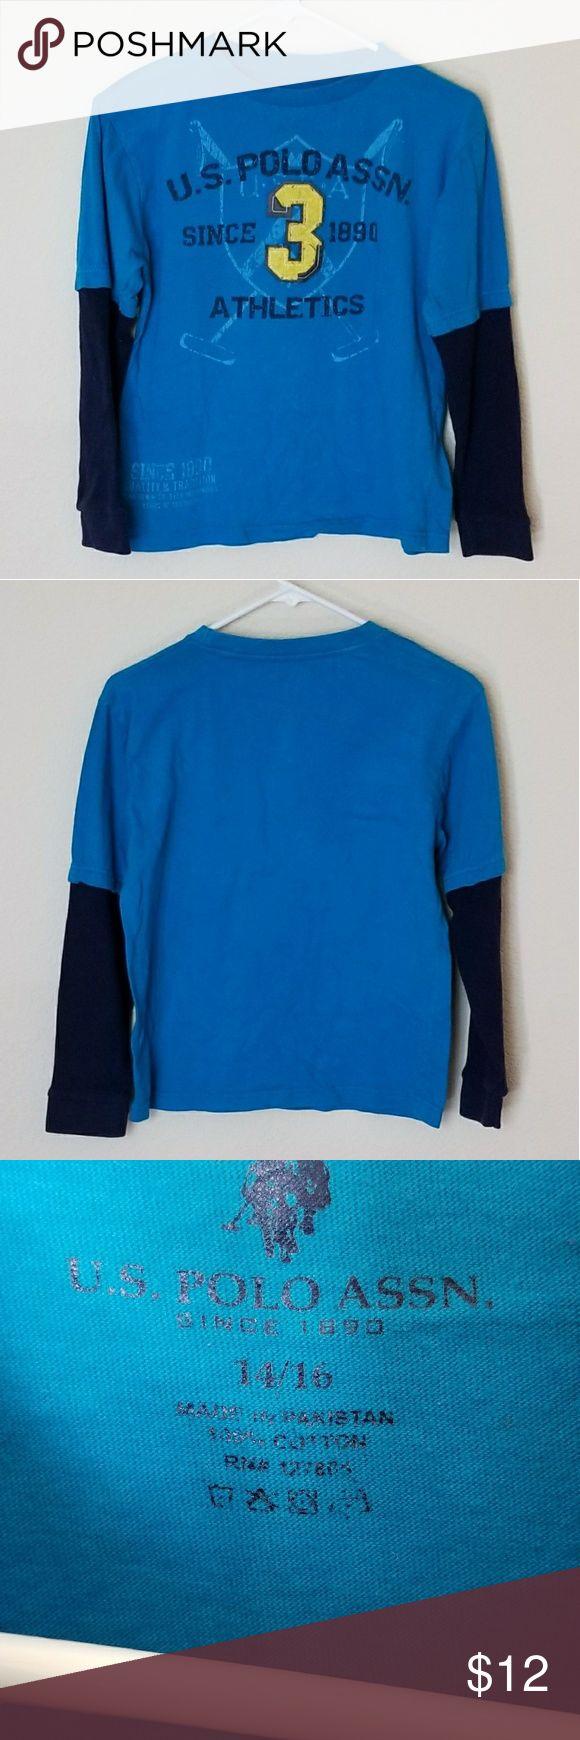 U.S. Polo Association Graphic T Shirt U.S. Polo Association Graphic T Shirt in great condition U.S. Polo Assn. Shirts & Tops Tees - Long Sleeve